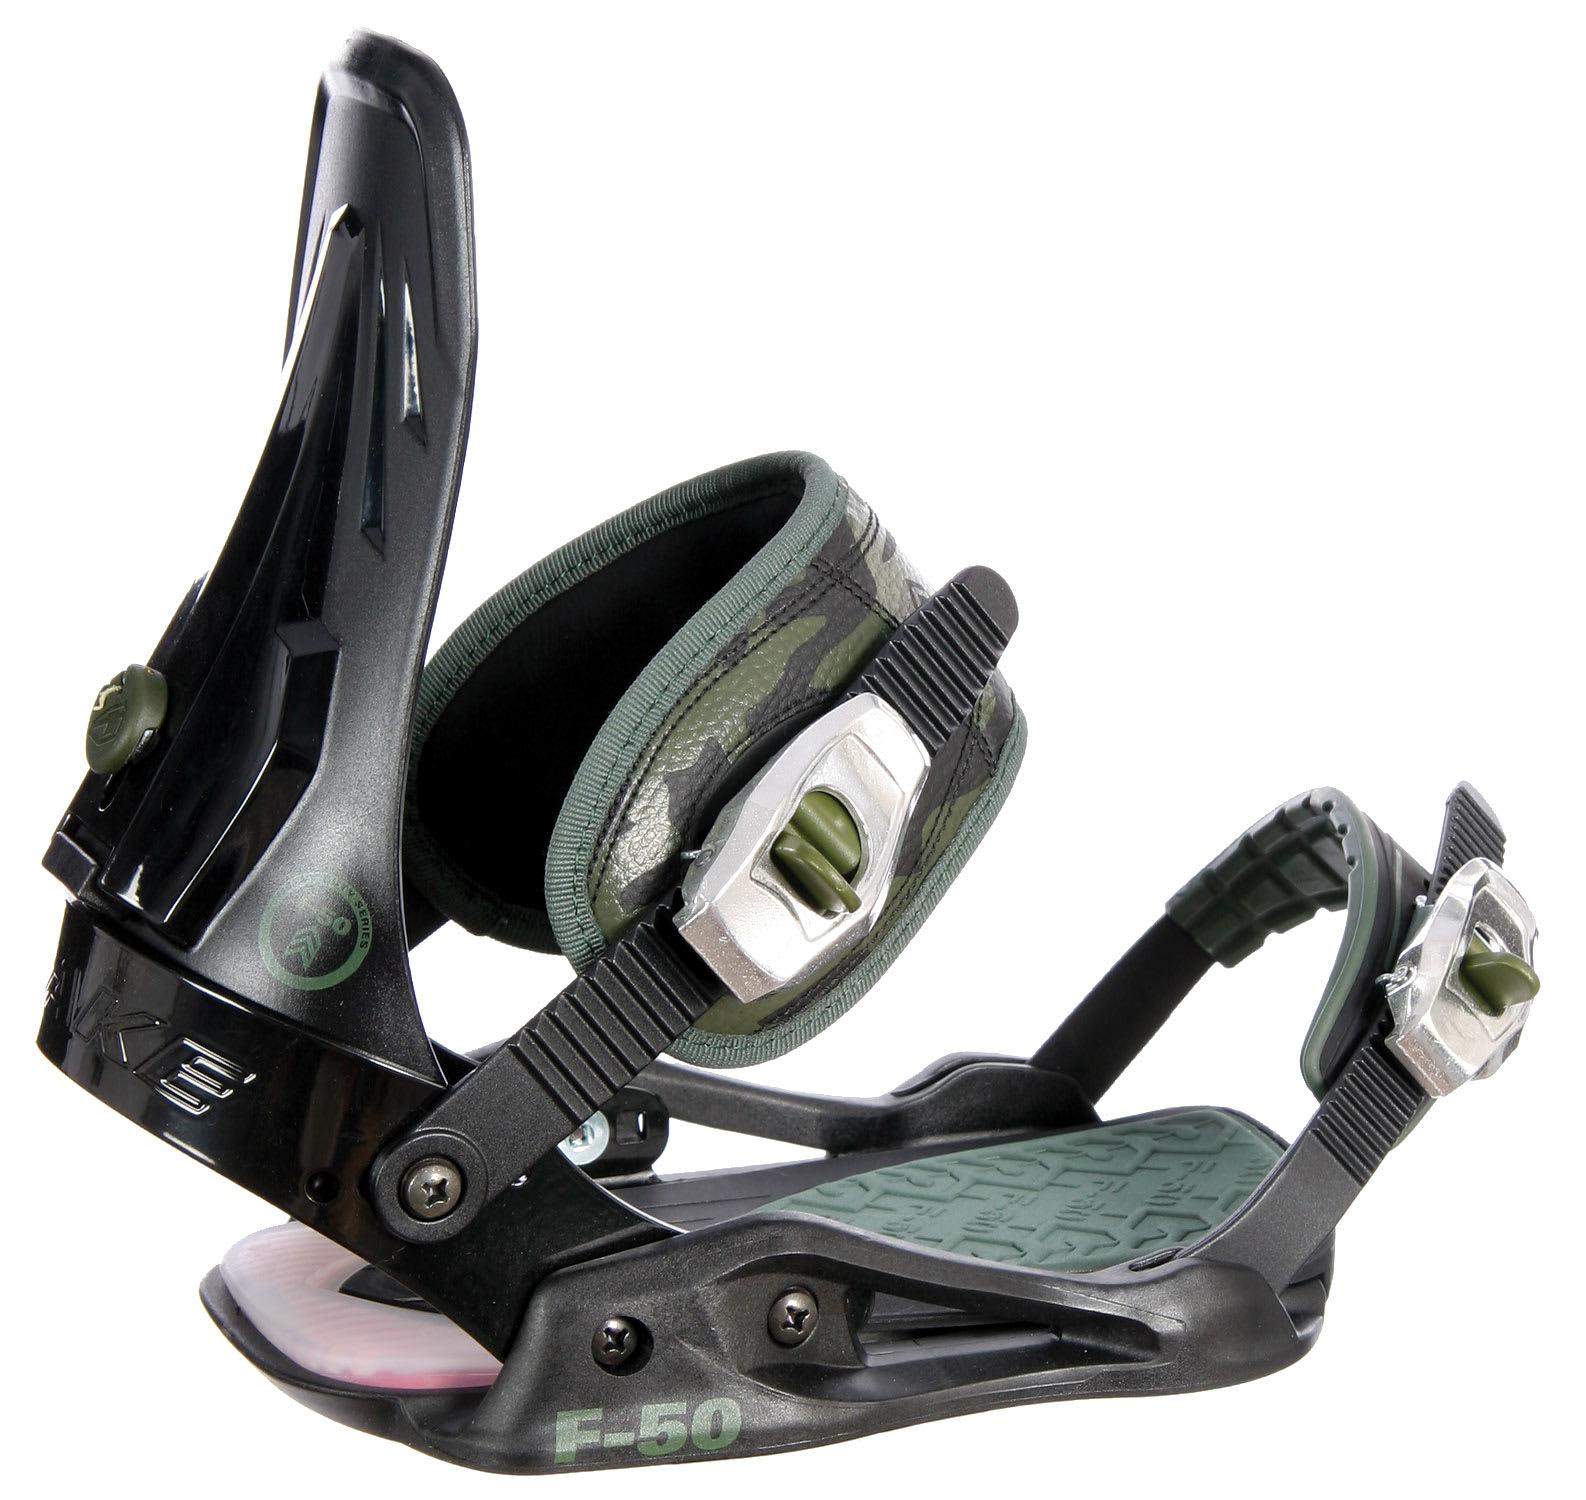 Drake Fifty Lobster Snowboard Bindings: Drake F50 Snowboard Bindings